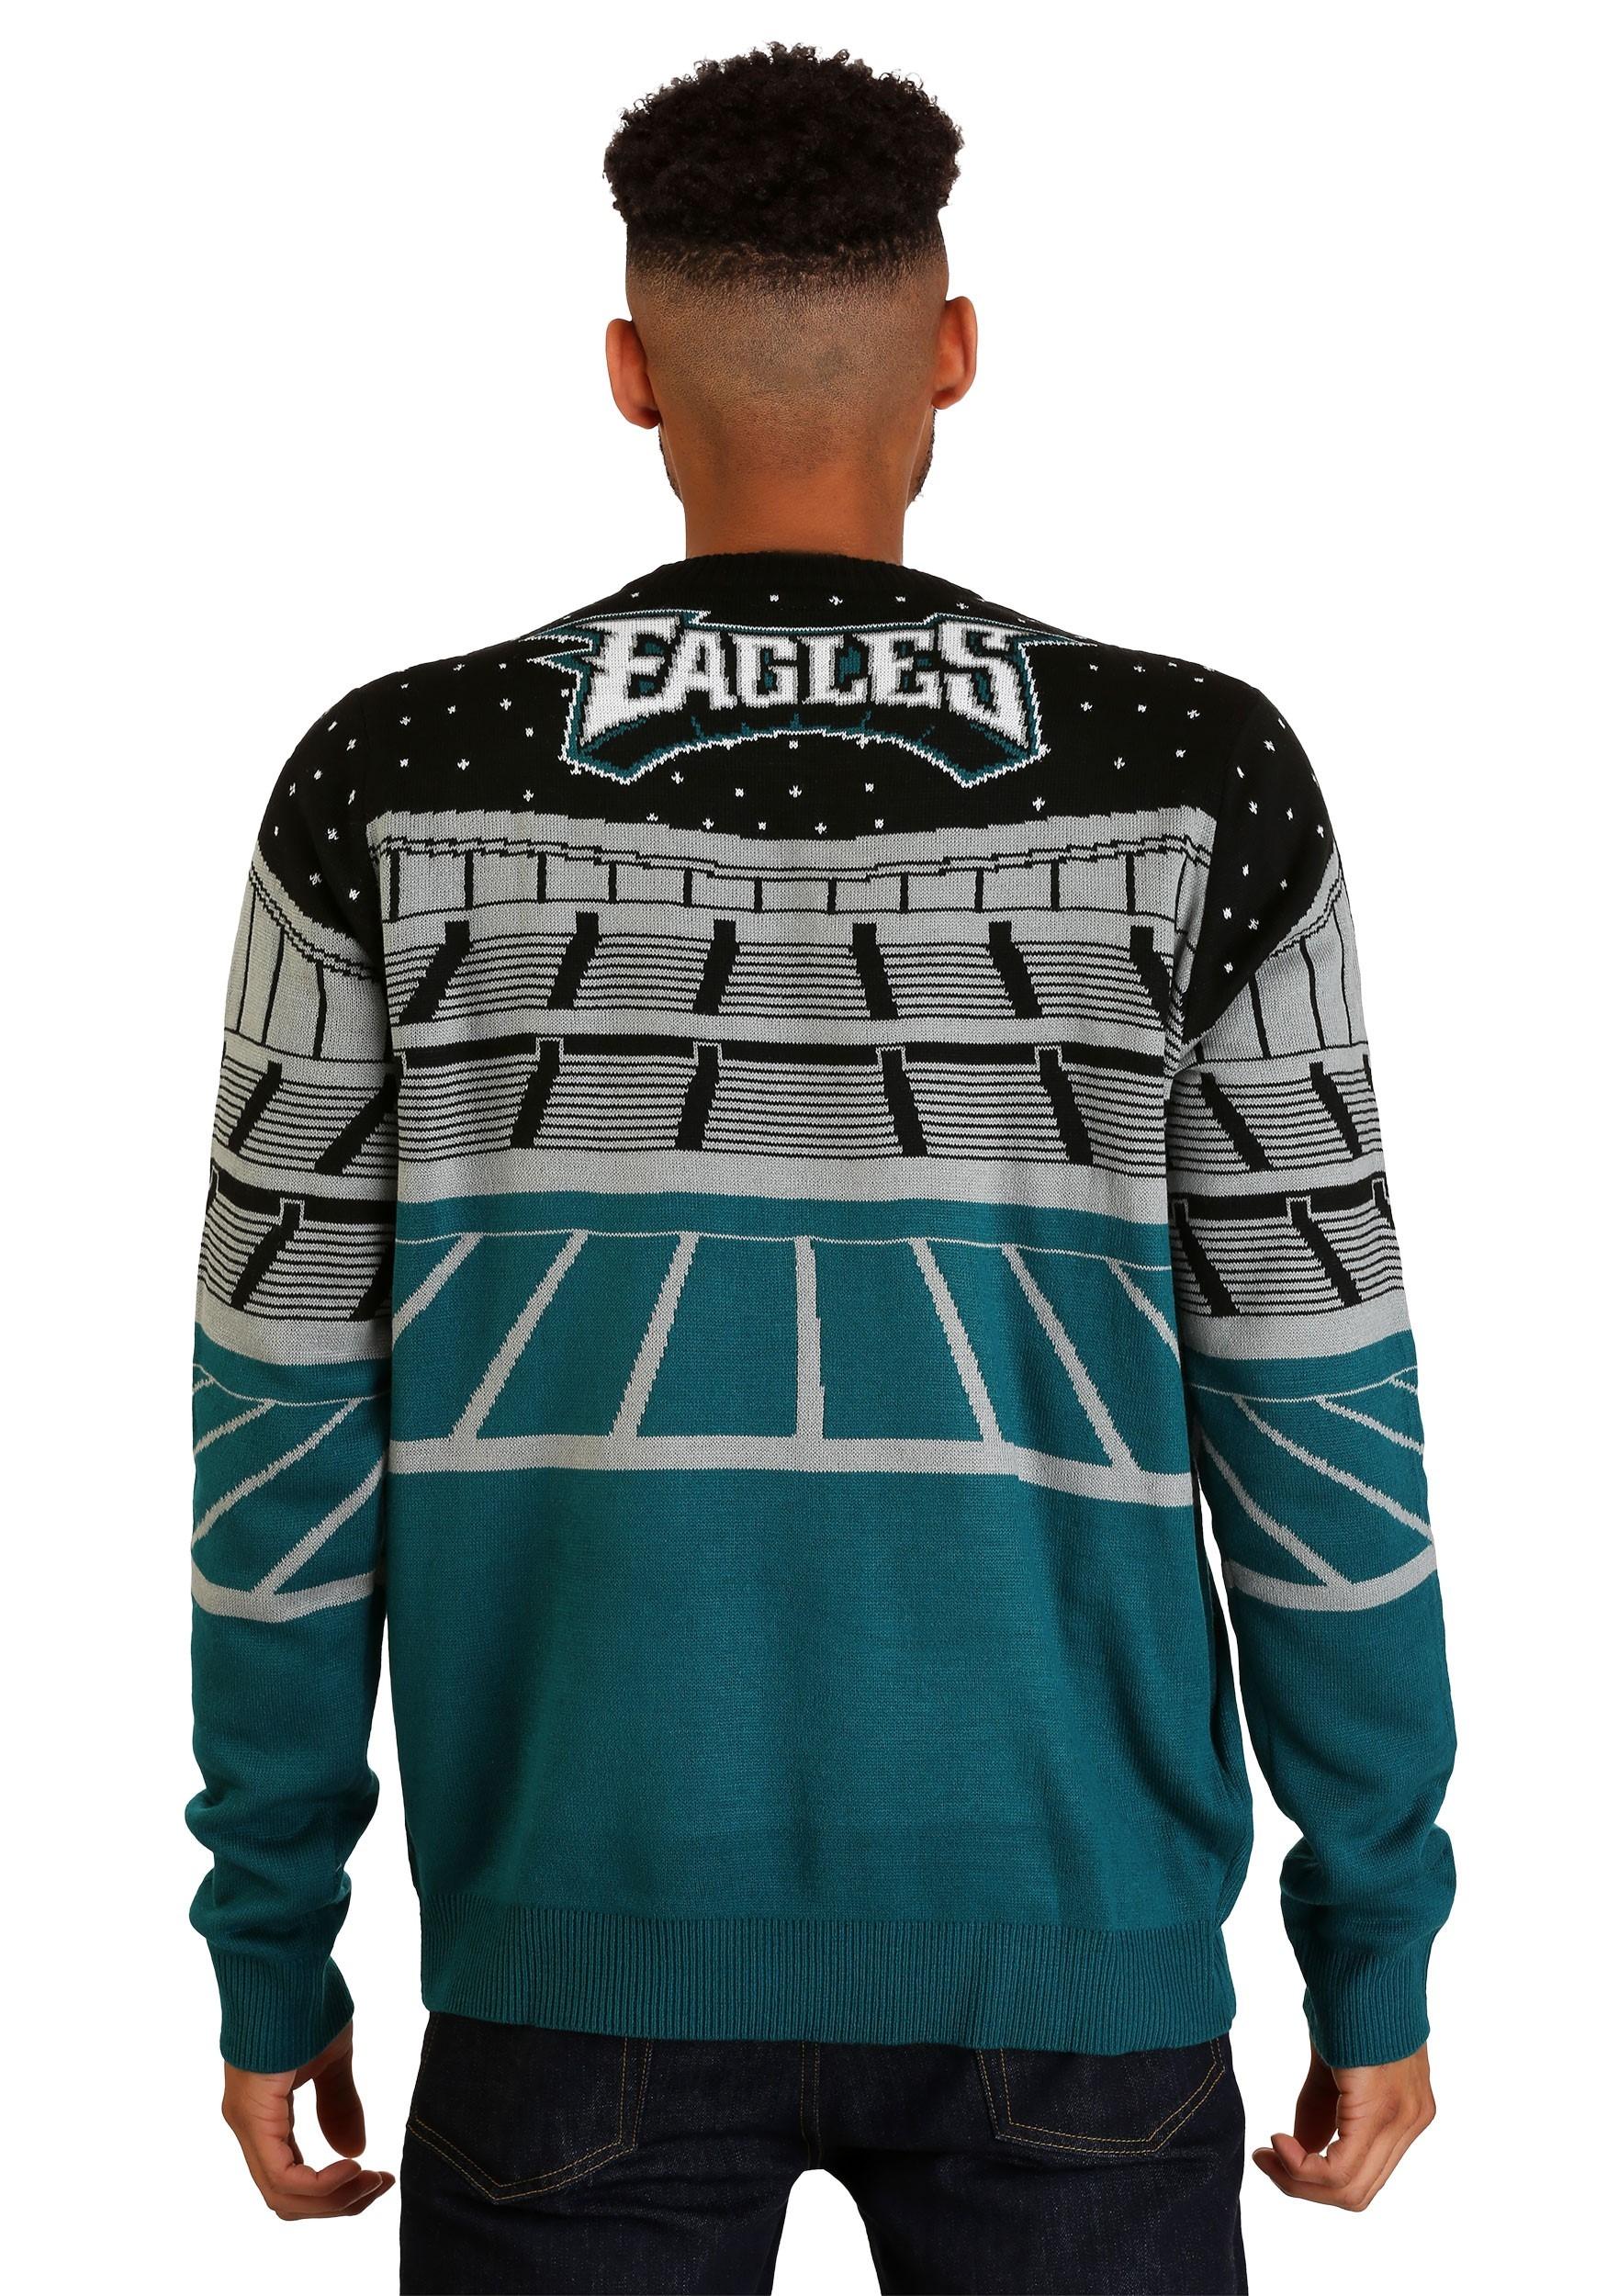 Philadelphia Eagles Light Up Bluetooth Ugly Christmas Sweater